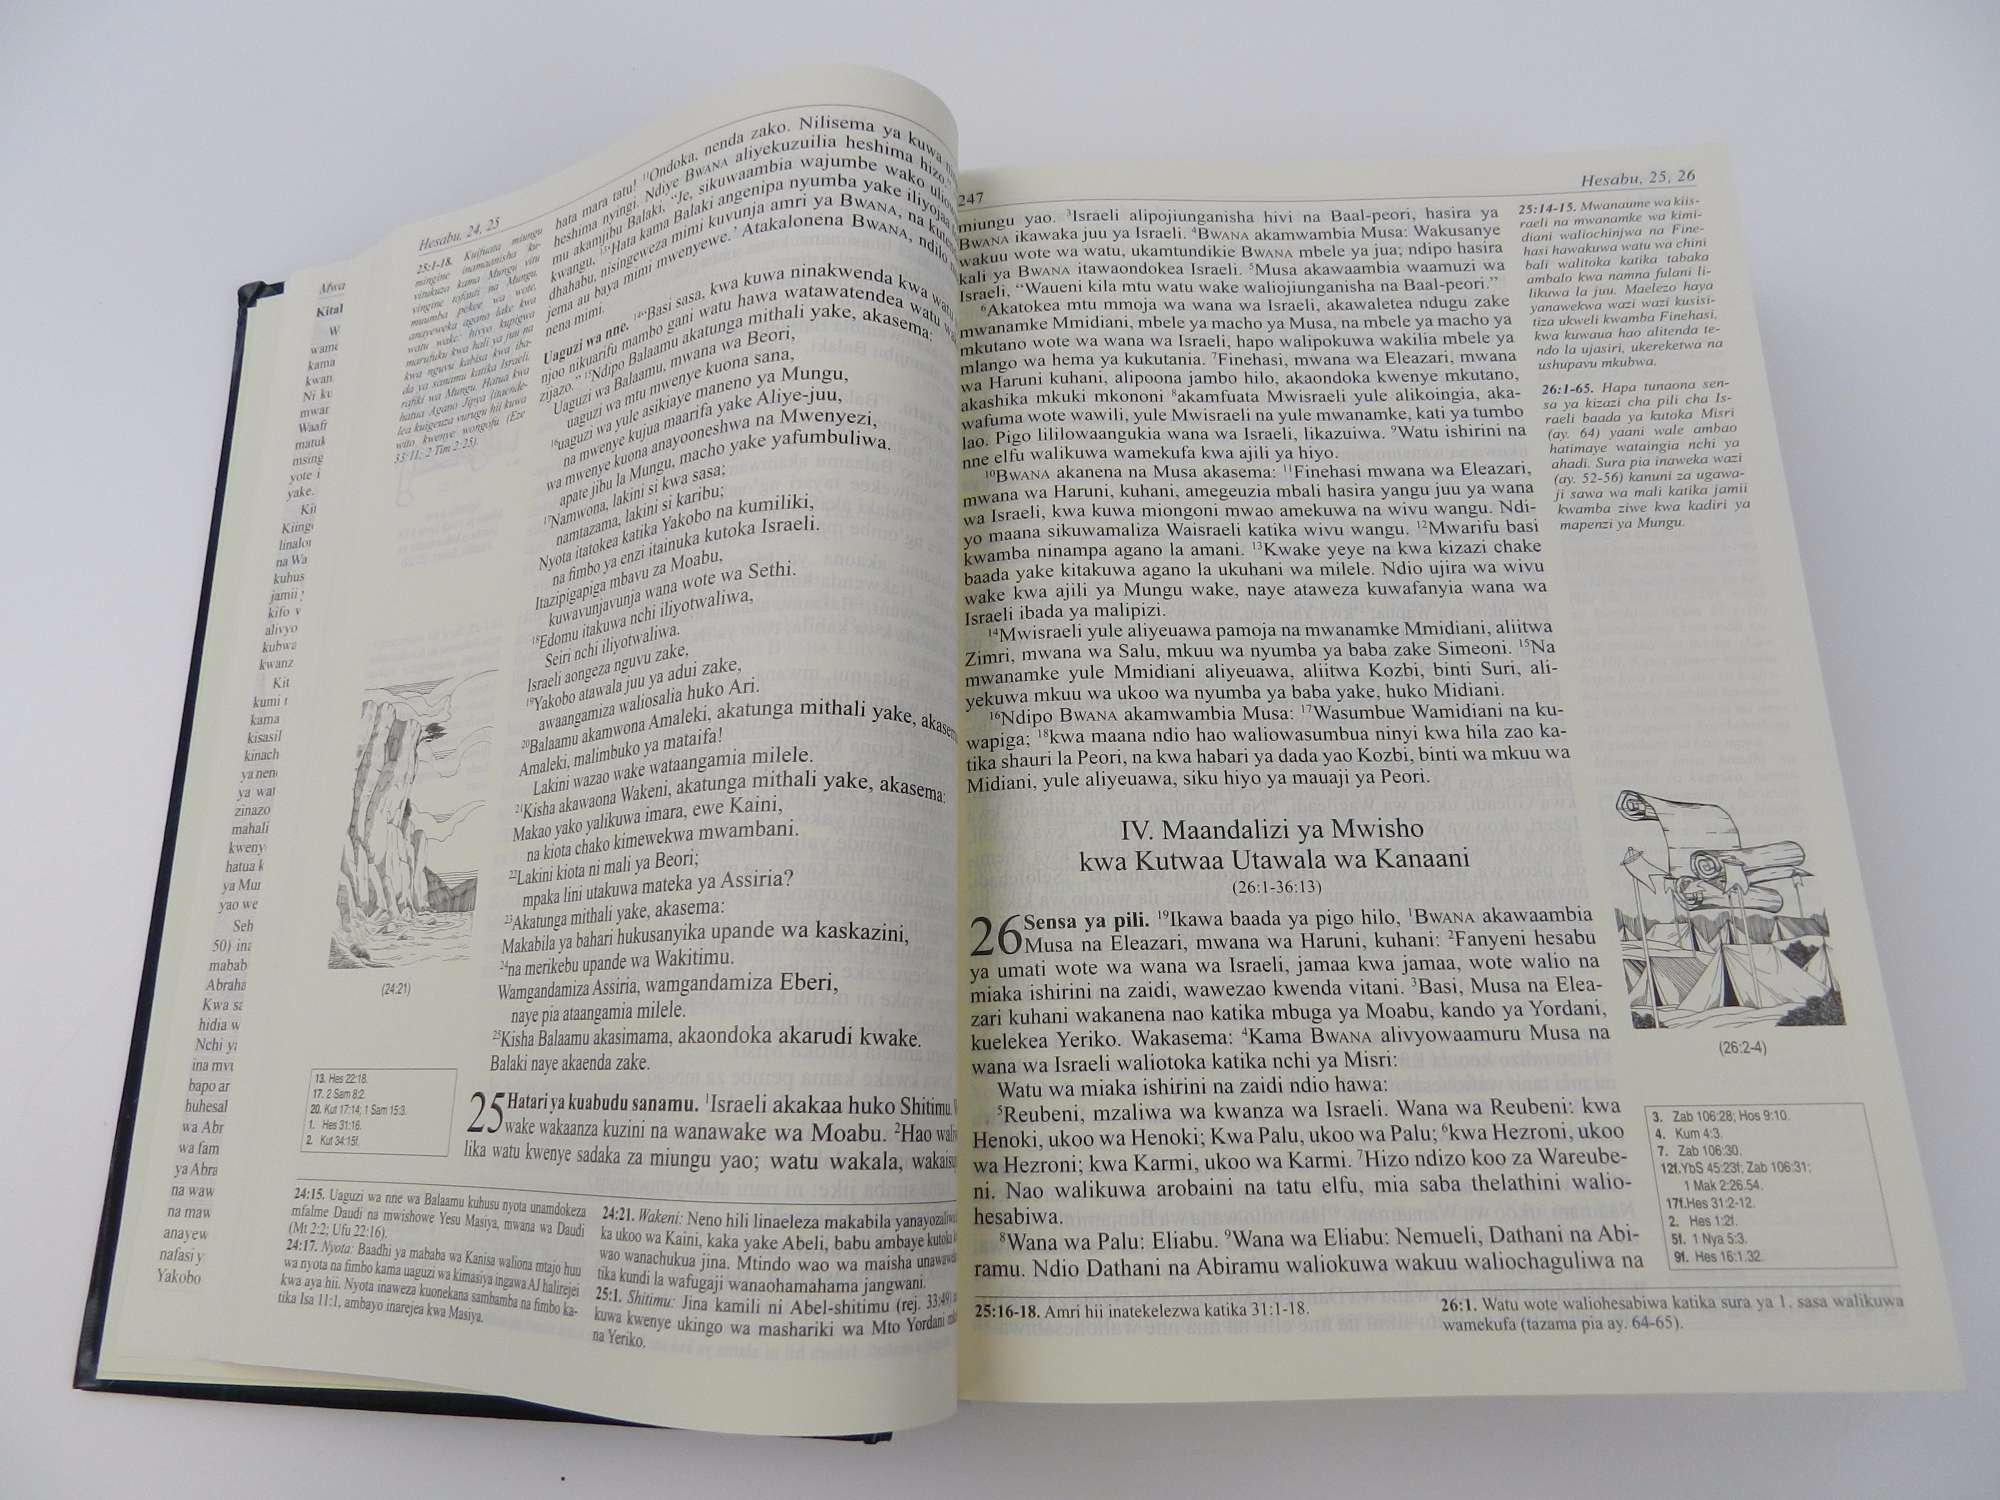 The African Bible Swahili Language With Study Notes And Many Illustrations Dark Green Hardcover Biblia Ya Kiafrika Catholic Community Bible Bible Society 0700535069588 Amazon Com Books